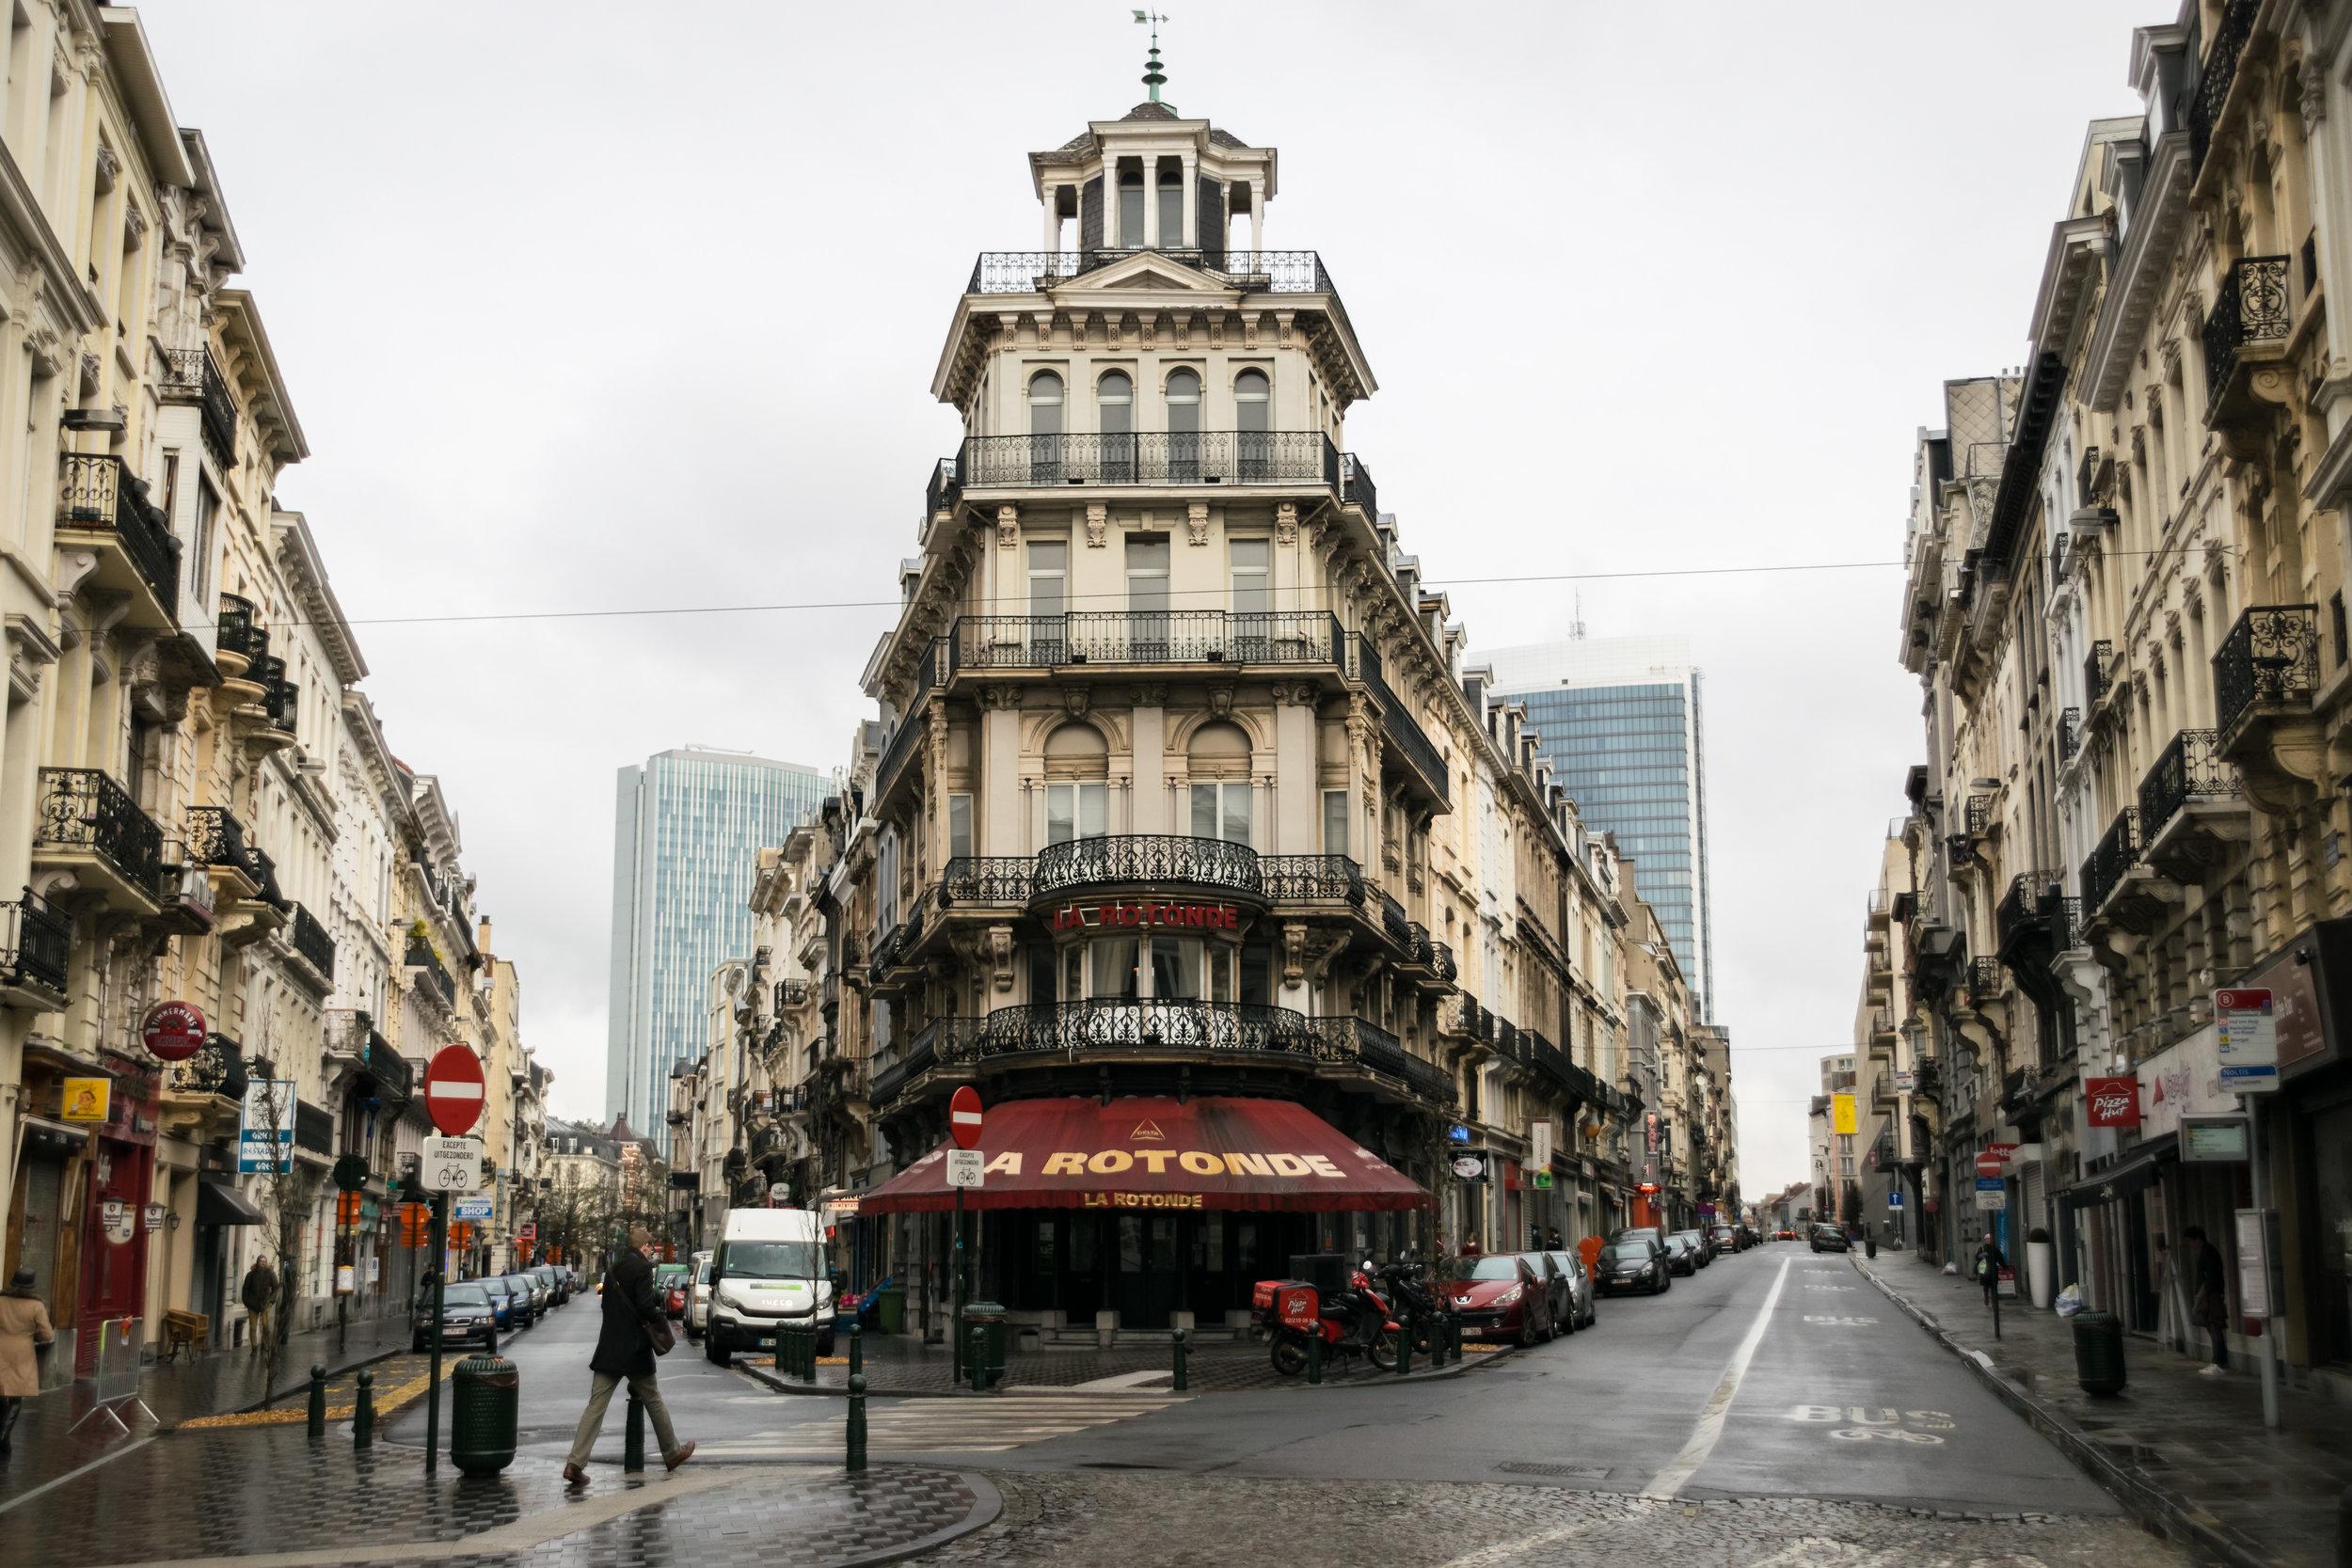 not Art Nouveau but beautiful street view